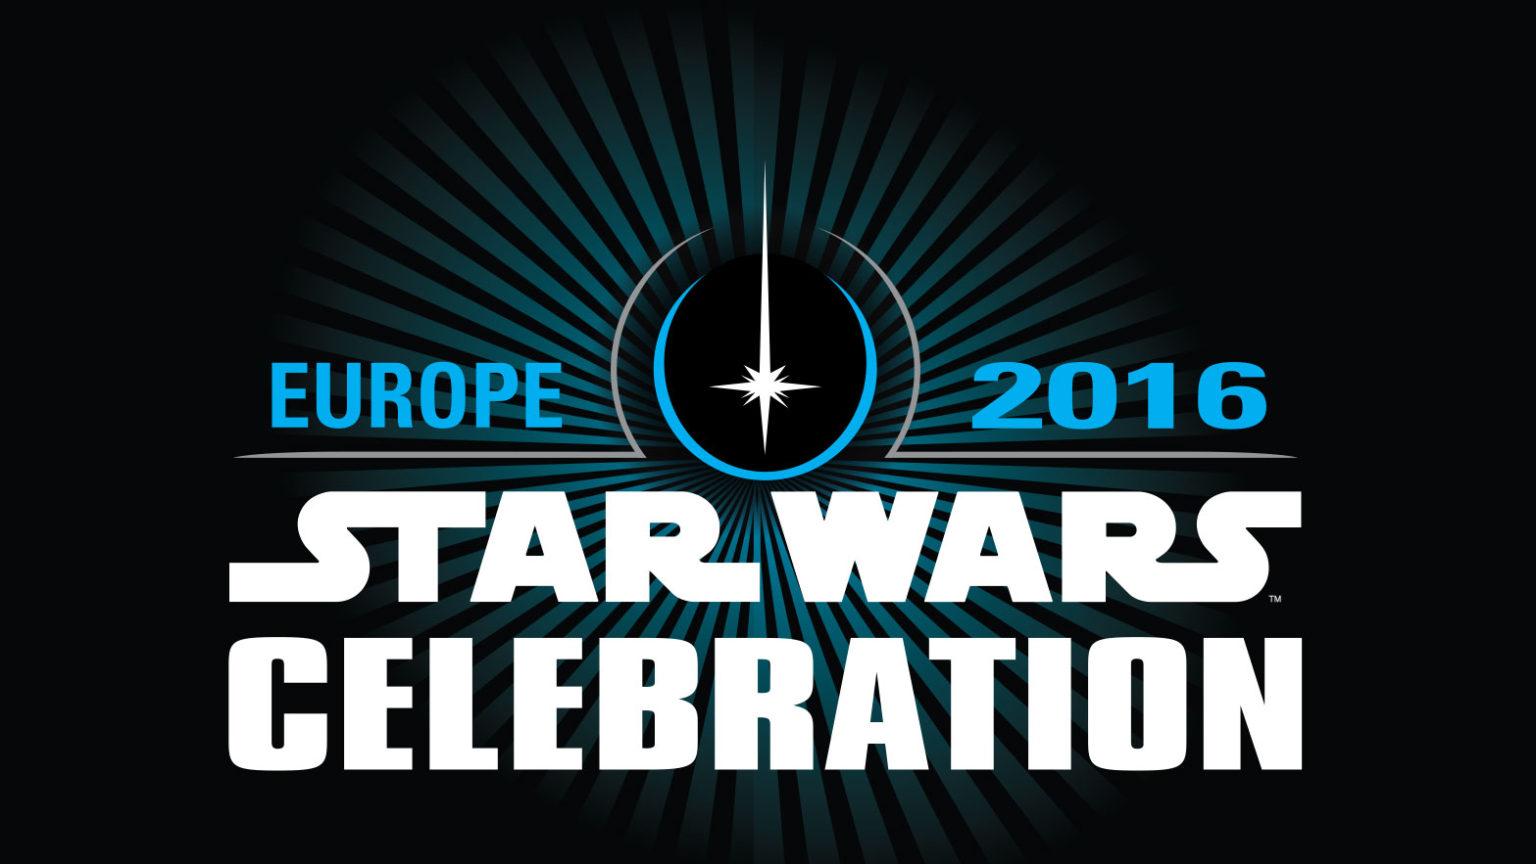 Star Wars Celebration Europe 2016 - Star Wars, Fandom and Cosplay